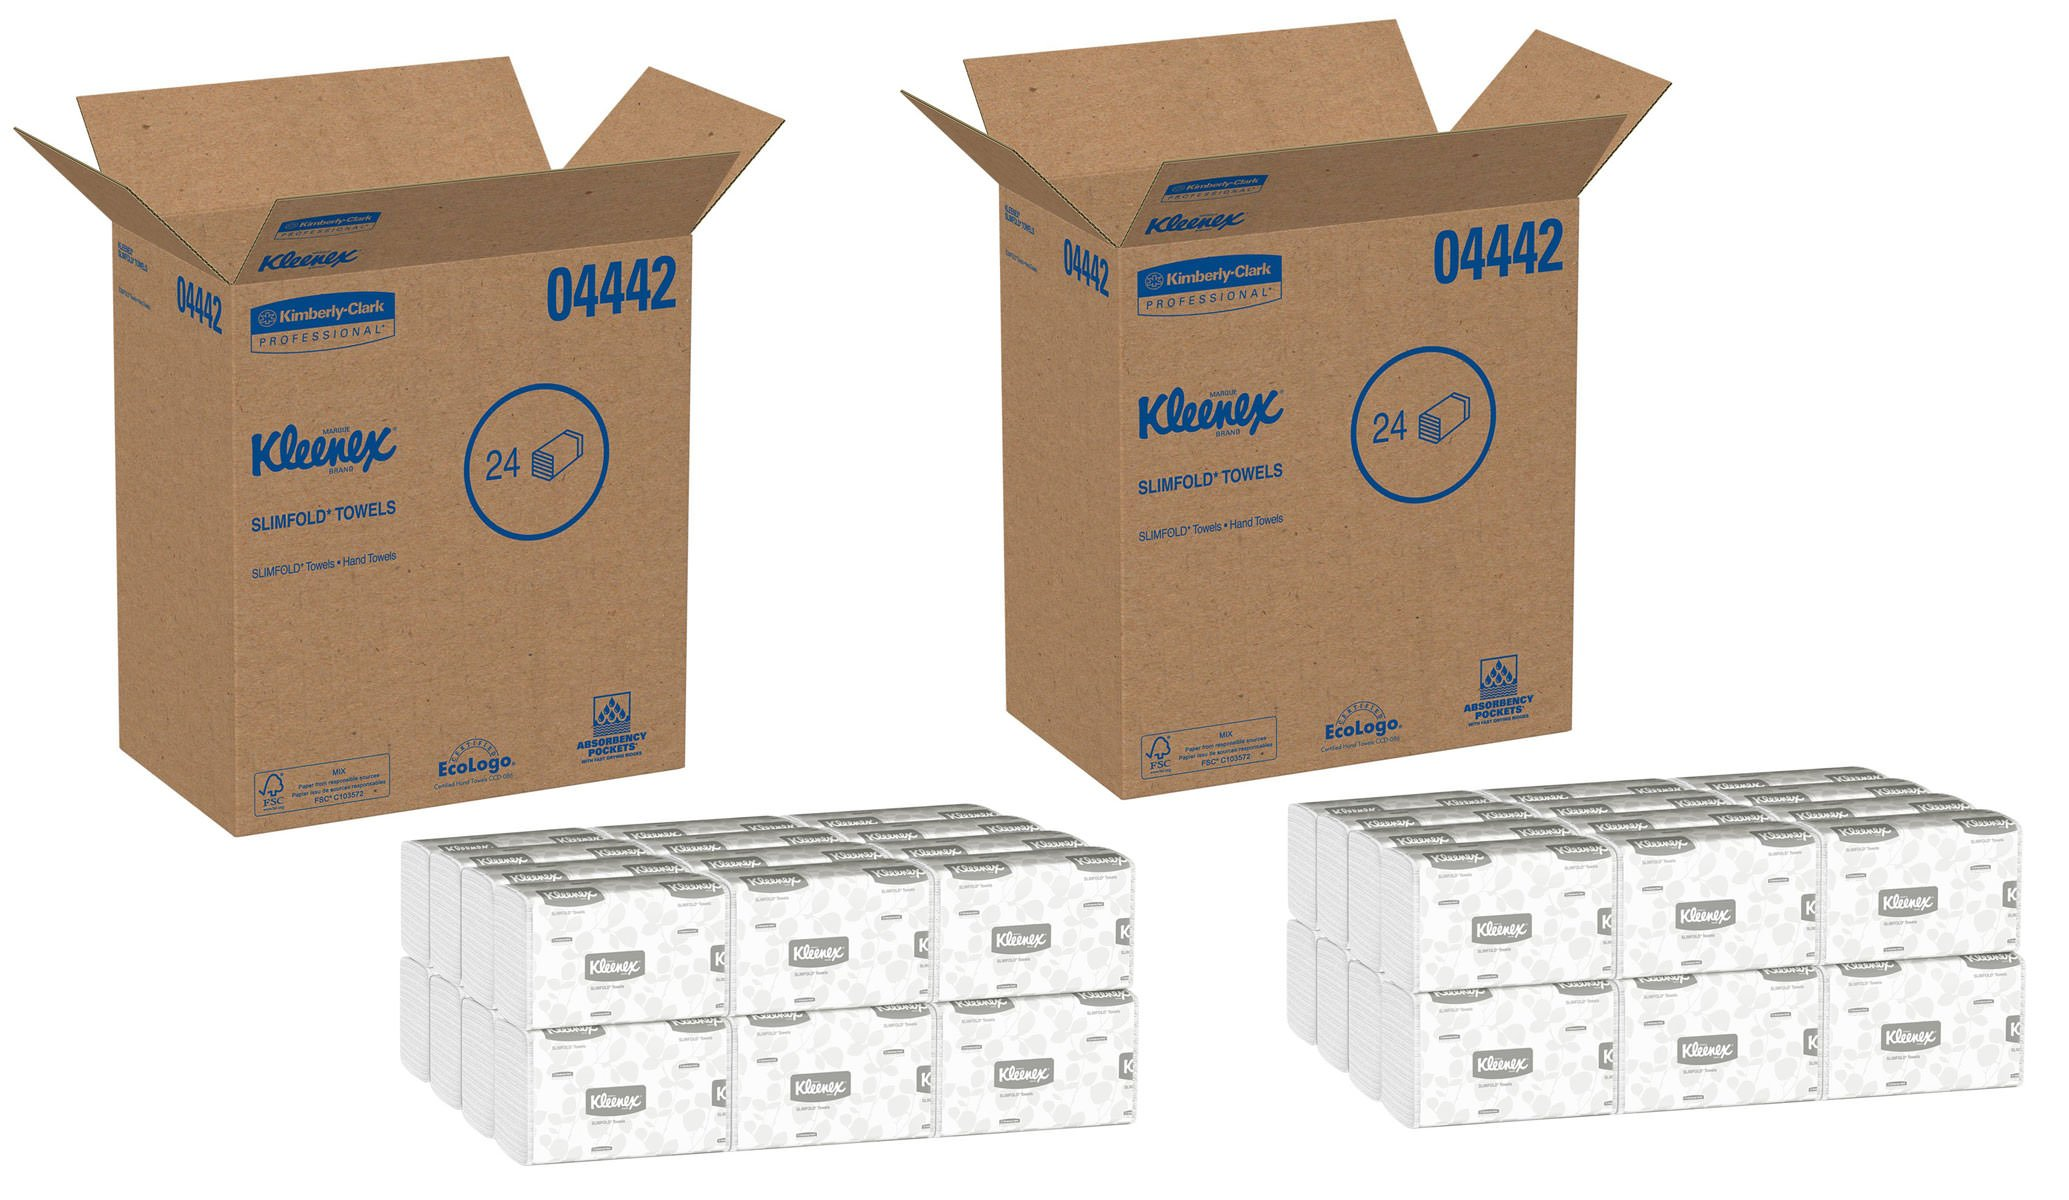 Kleenex 04442 Slimfold Paper Towels, 7 1/2 x 11 3/5, White, 90 per Pack (Case of 24 Packs), 2 Case